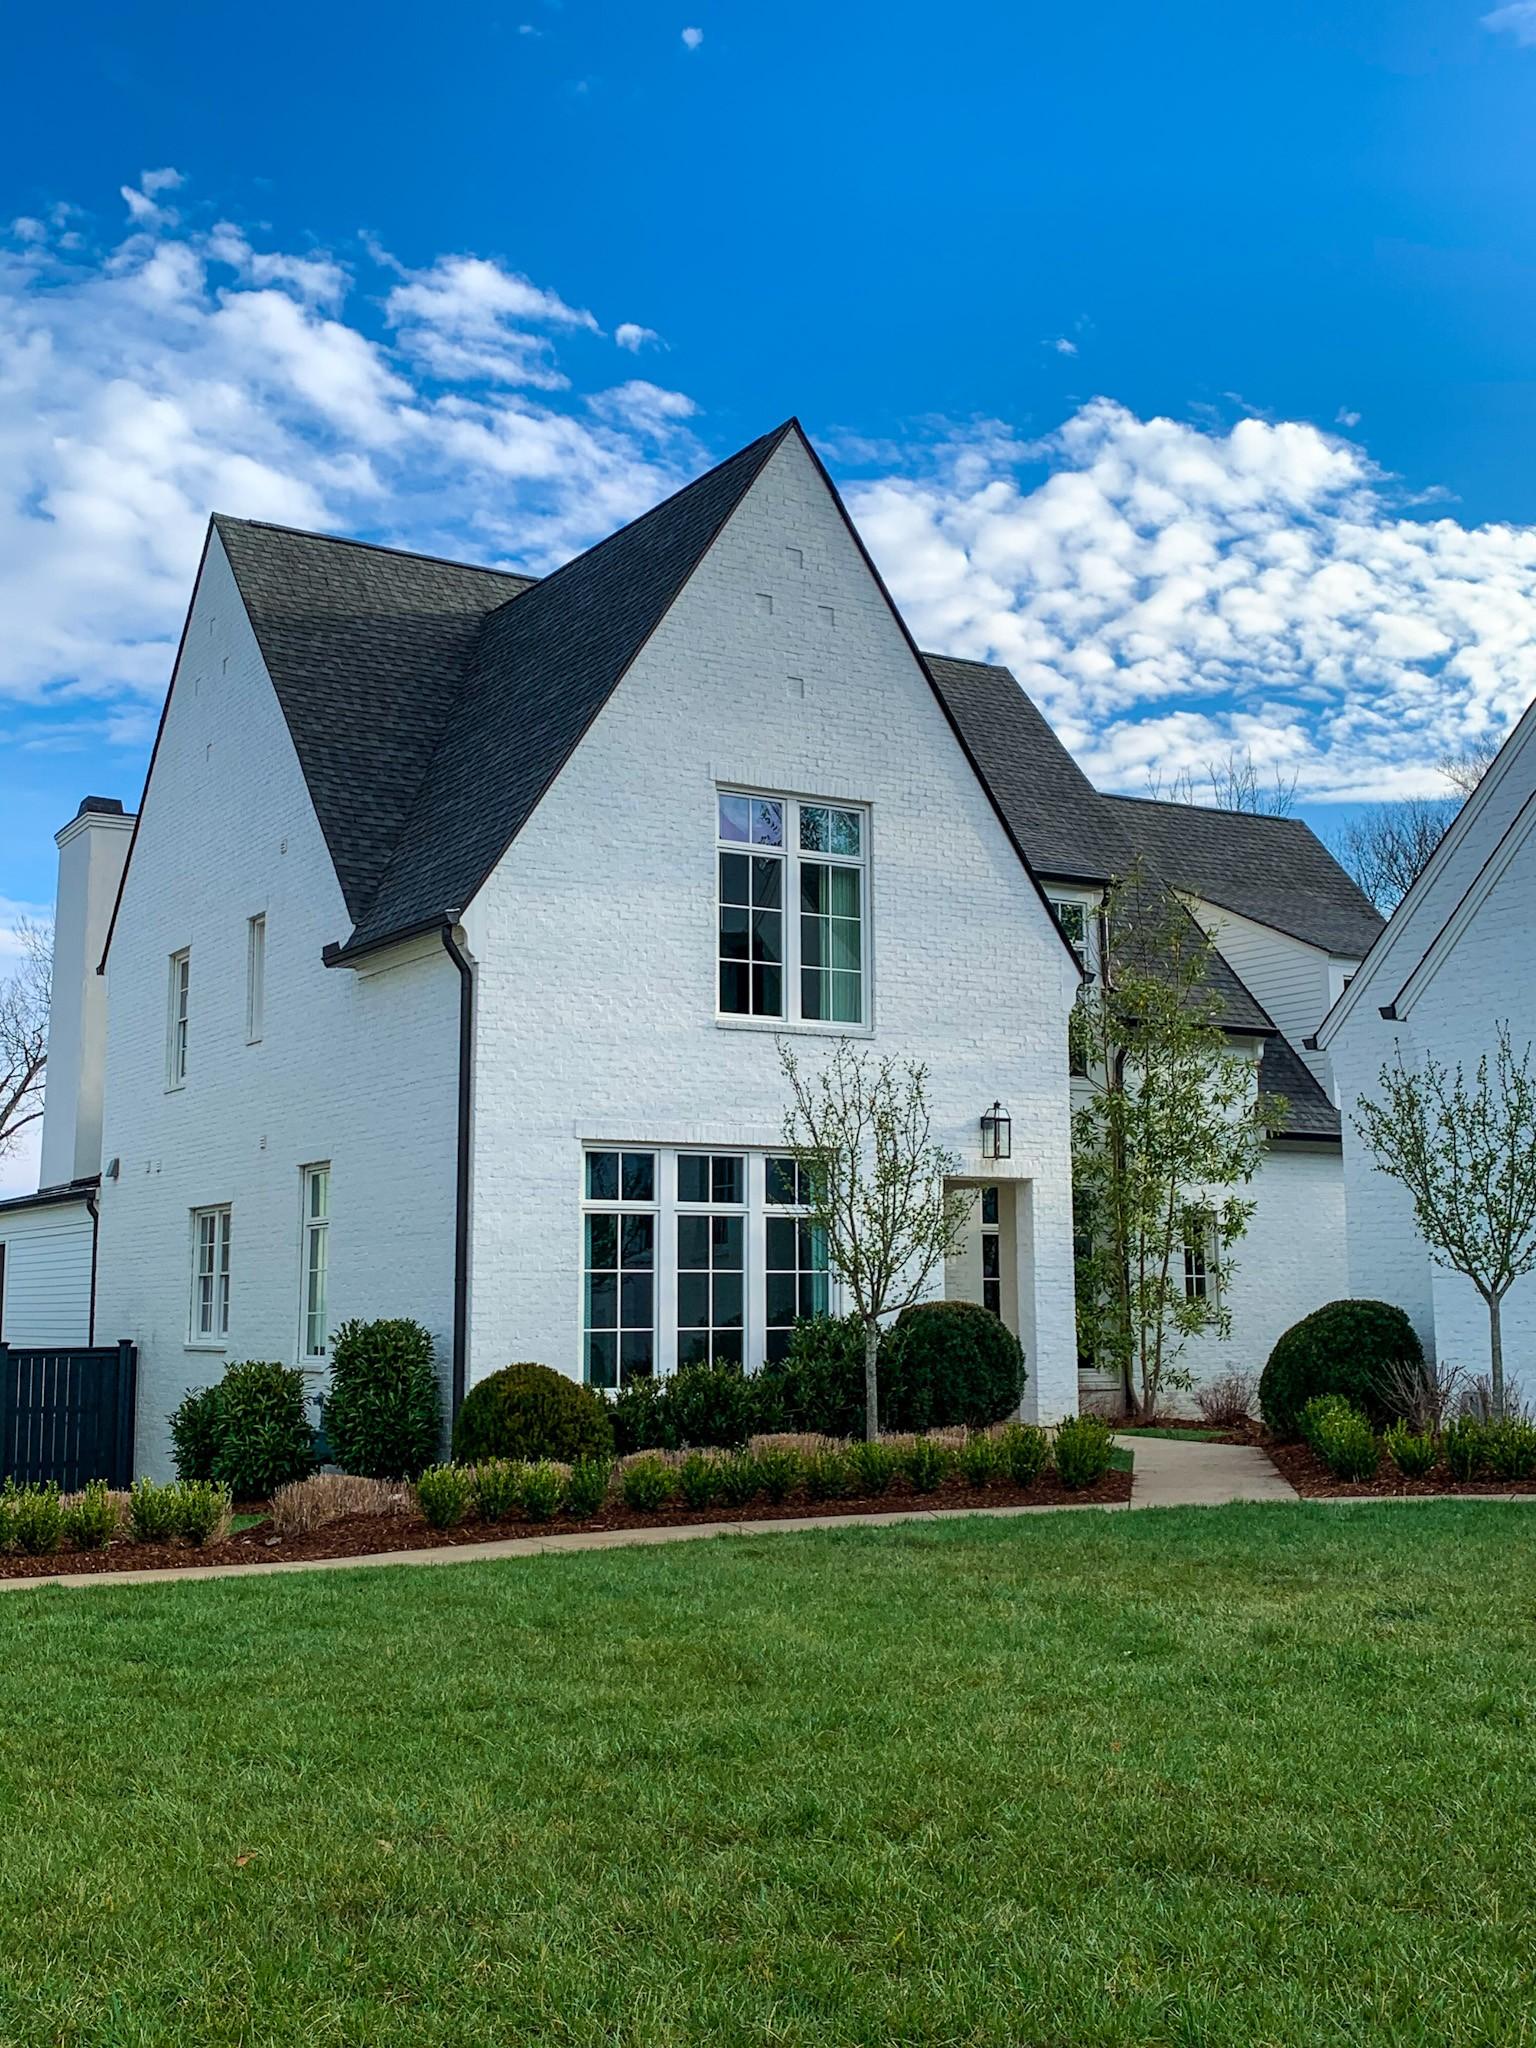 956 Battery Ln, Nashville, TN 37220 - Nashville, TN real estate listing